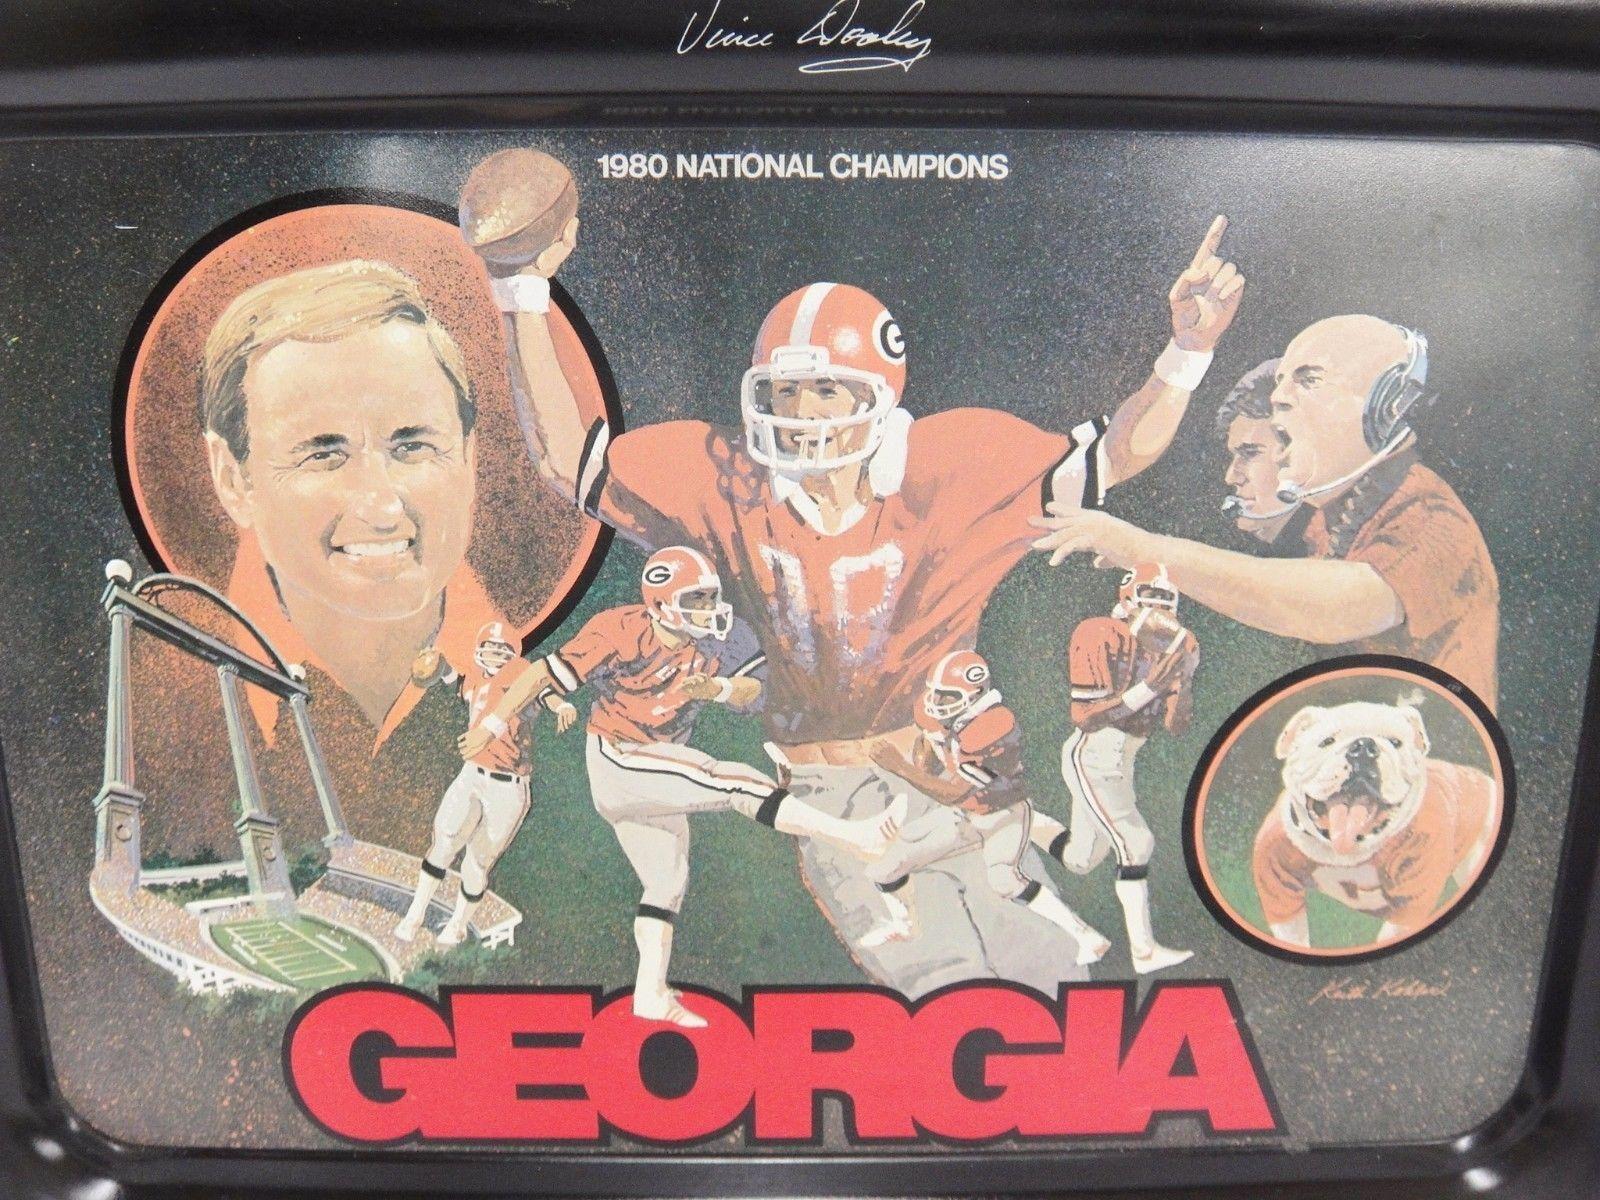 Coca Cola Georgia Bulldog Tray 1980 National Champions Vince Dooley Coach Rust